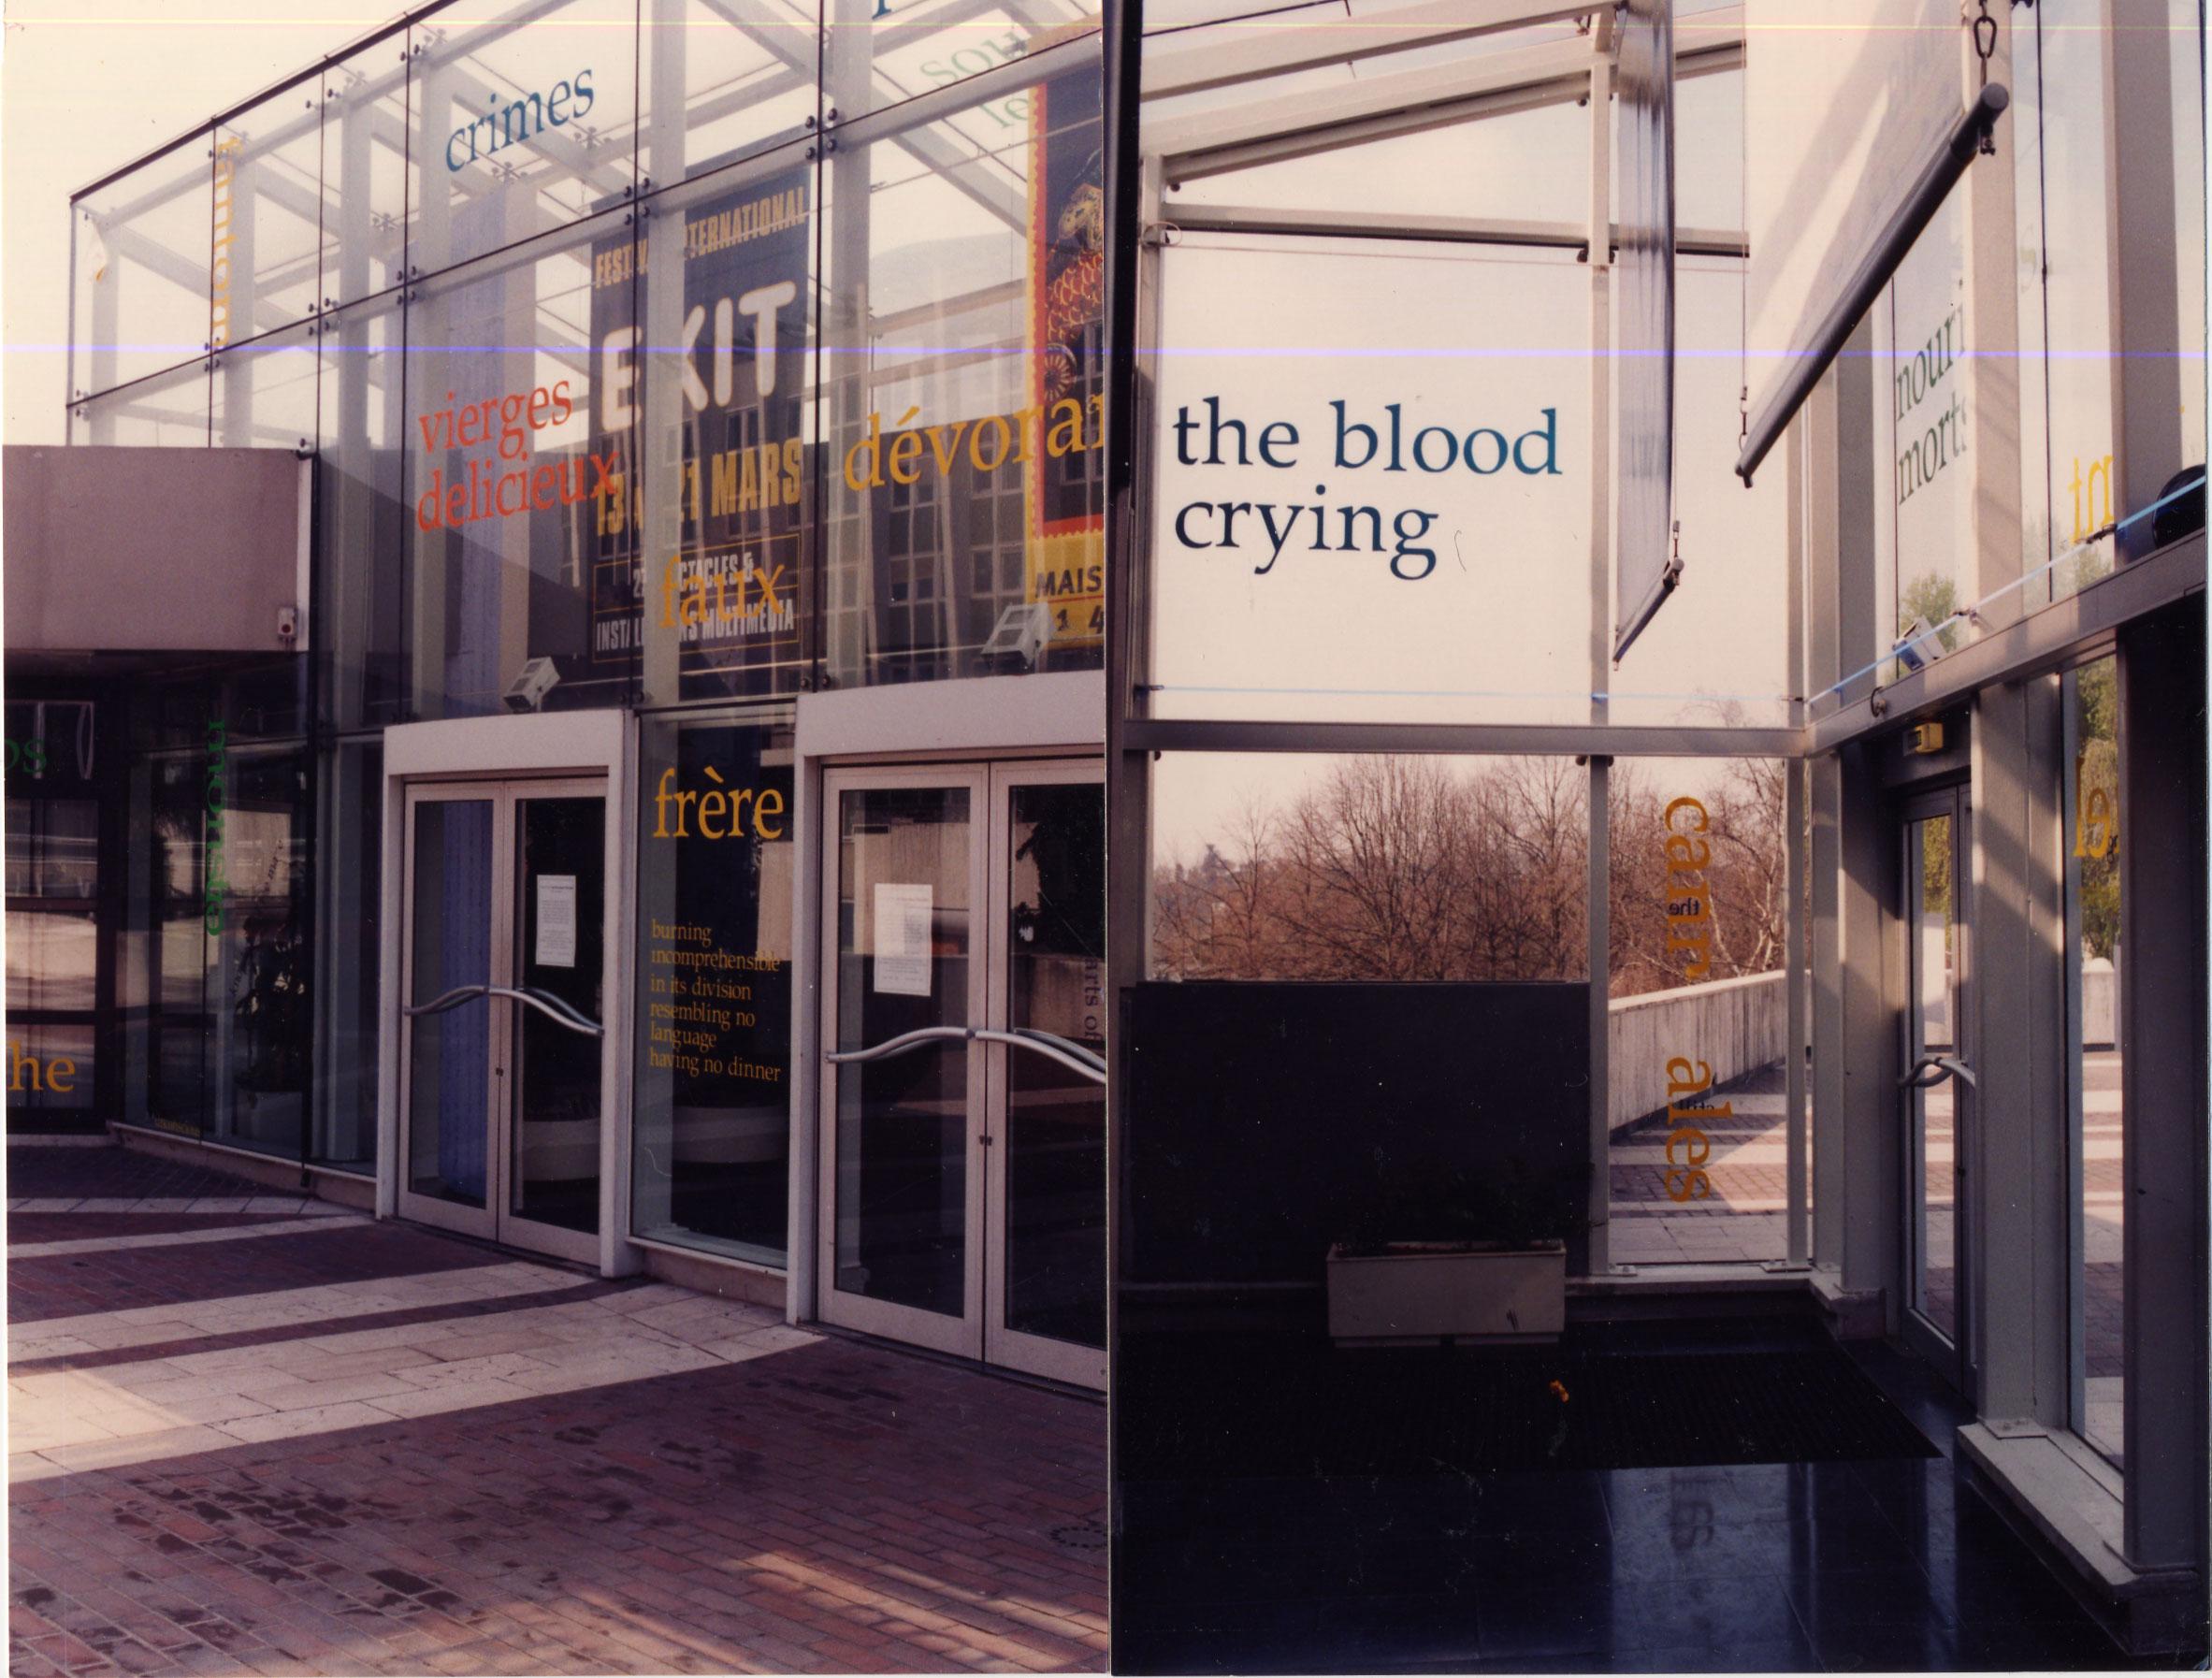 Créteil Installation, 1998 (2 of 2)